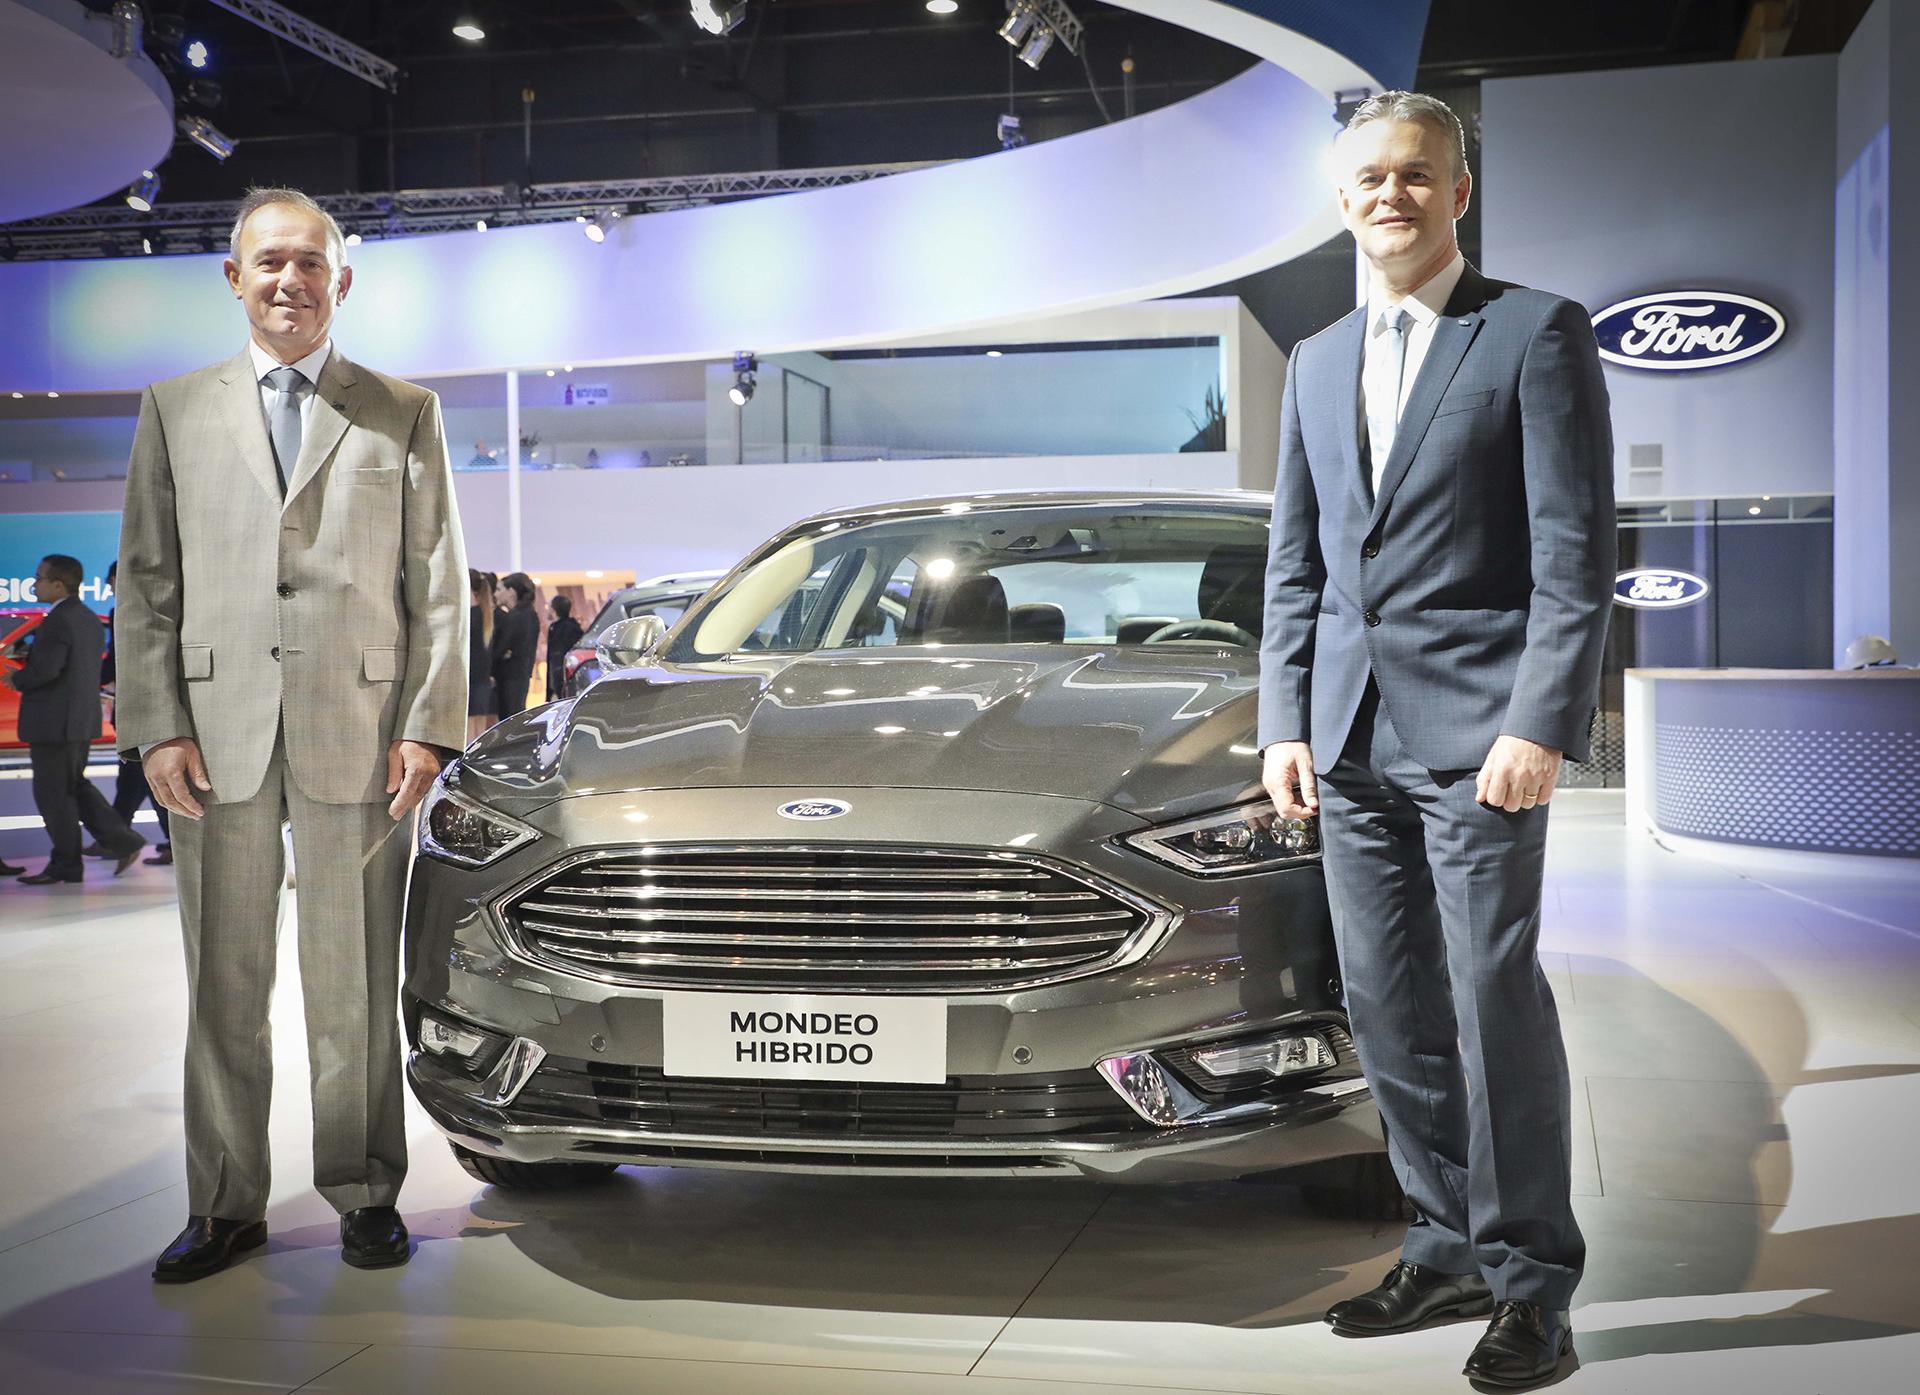 Lyle Watters, Vice Presidente de Ford Sudamérica y Enrique Alemañy Presidente de Ford Grupo Sur